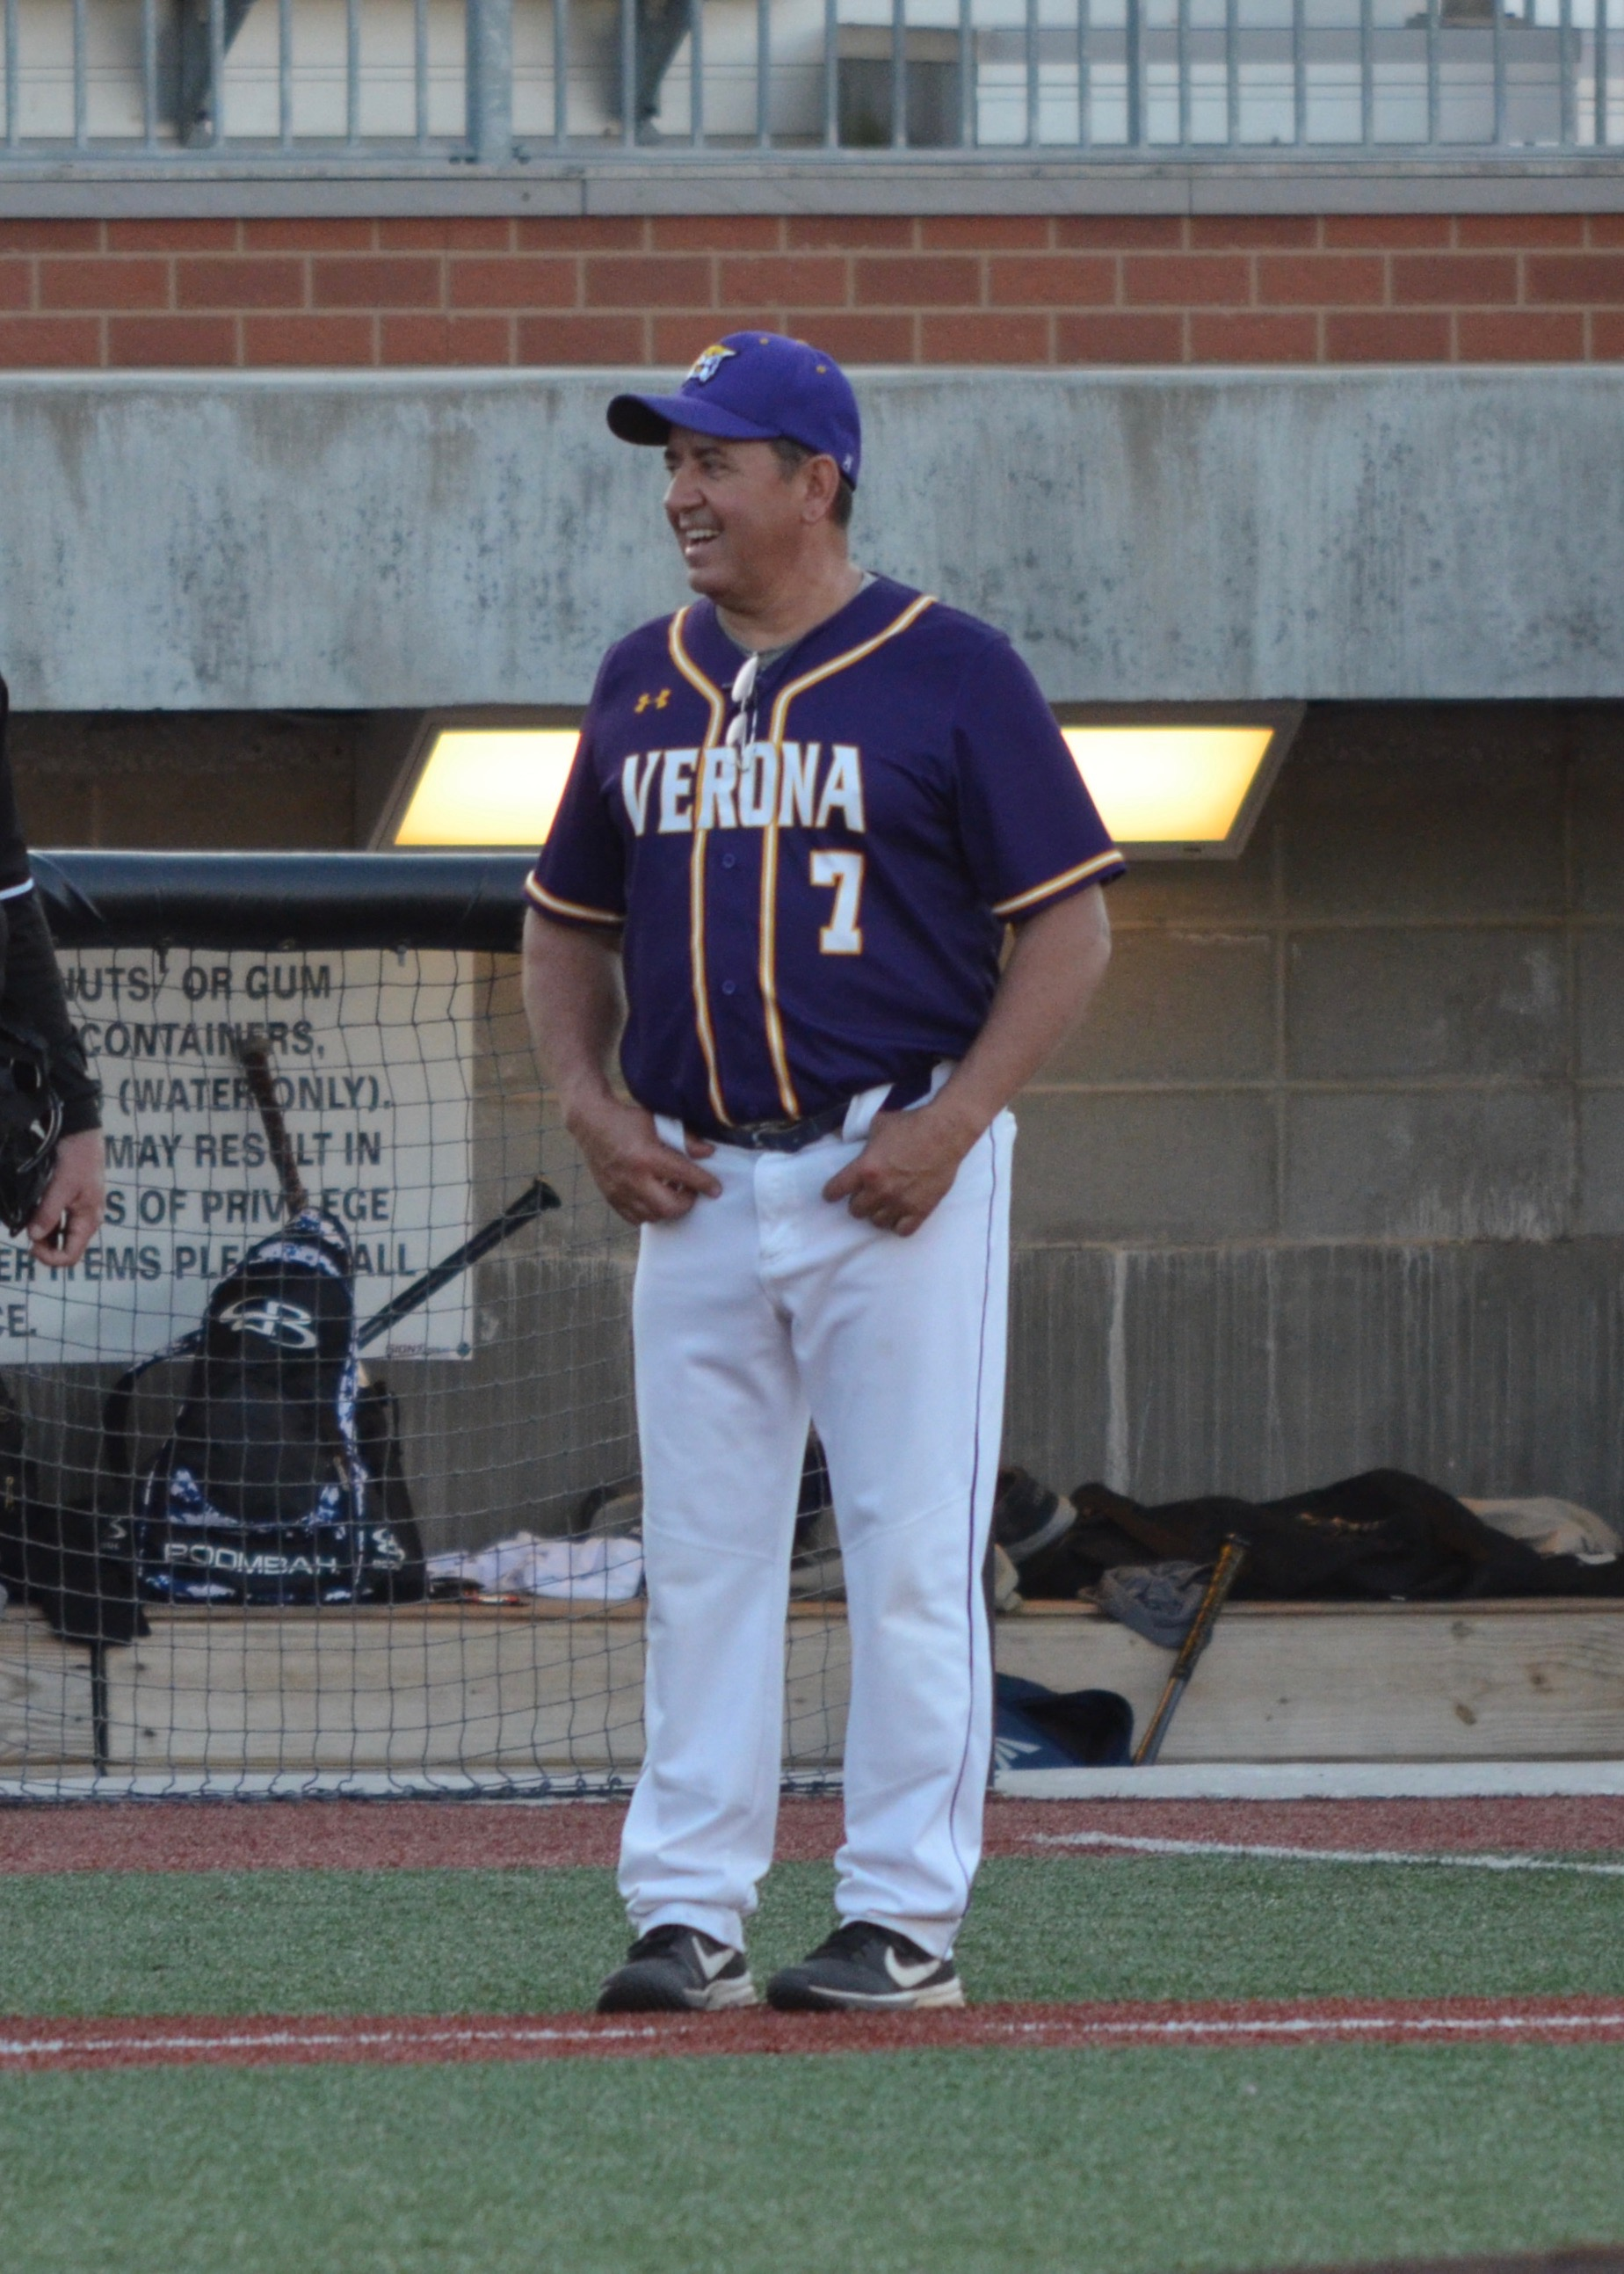 Coach Longley